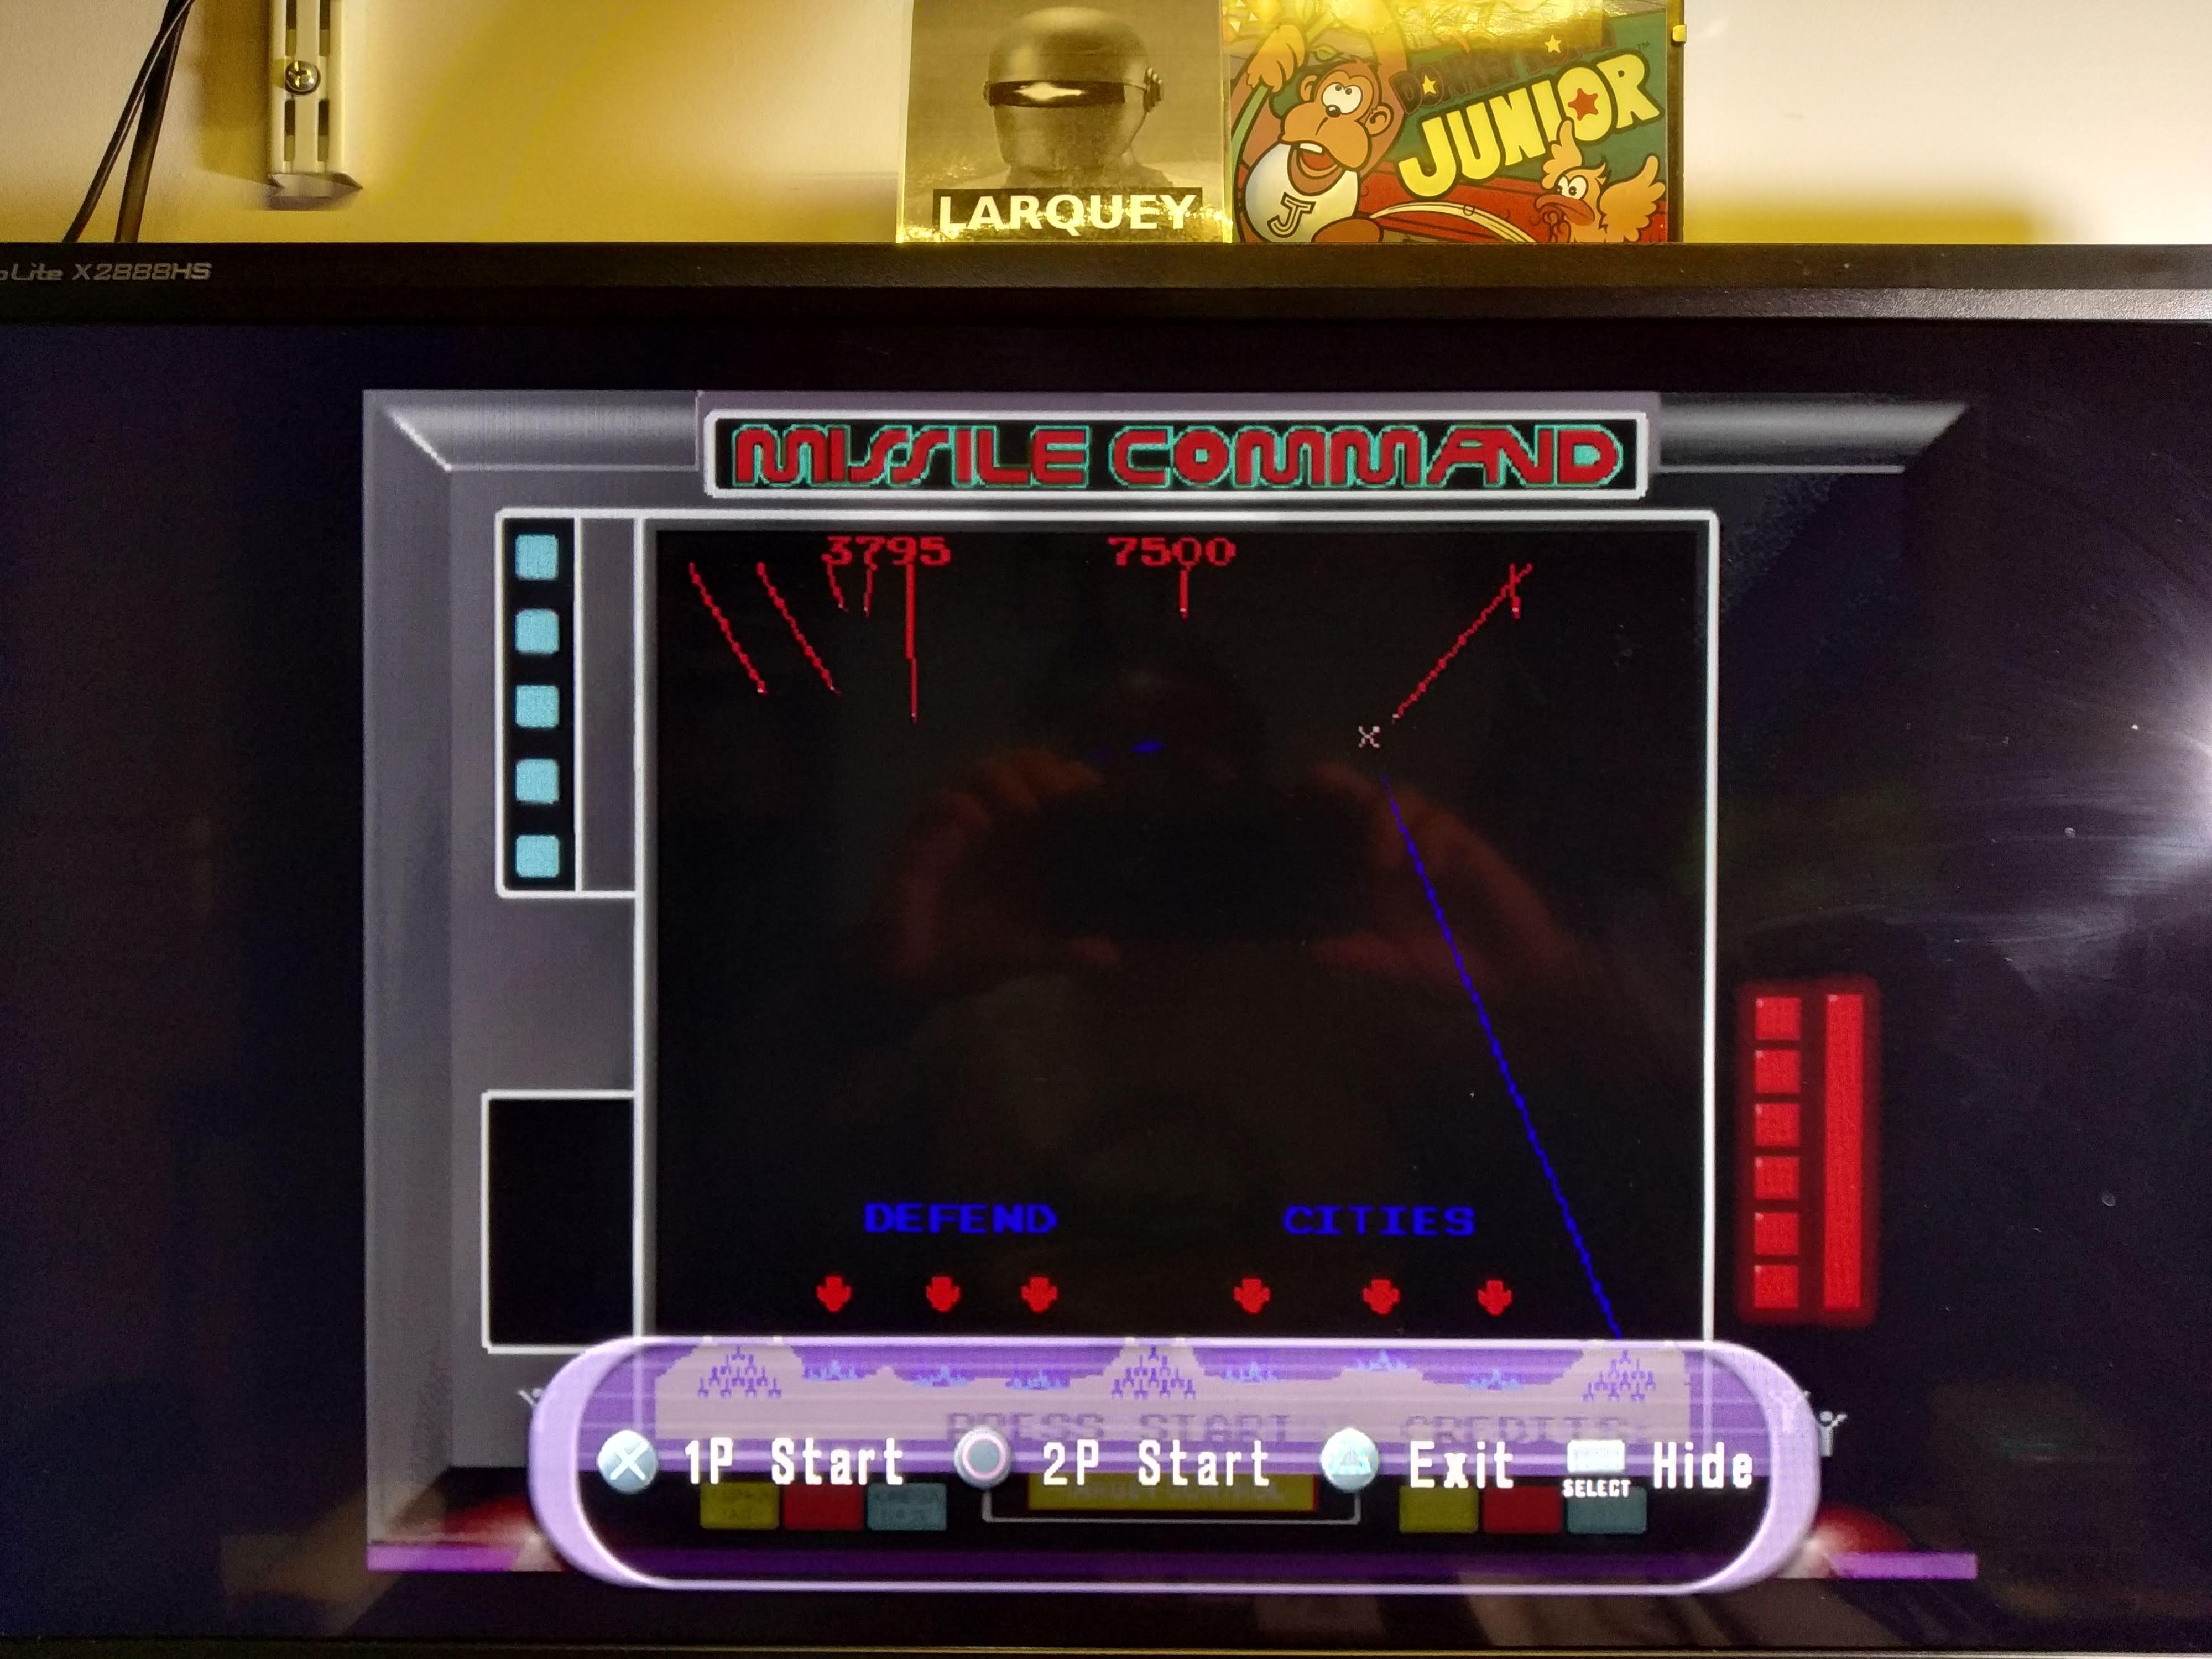 Larquey: Atari Anthology: Missile Command [Arcade Version] (Playstation 2 Emulated) 3,795 points on 2020-08-02 13:35:30